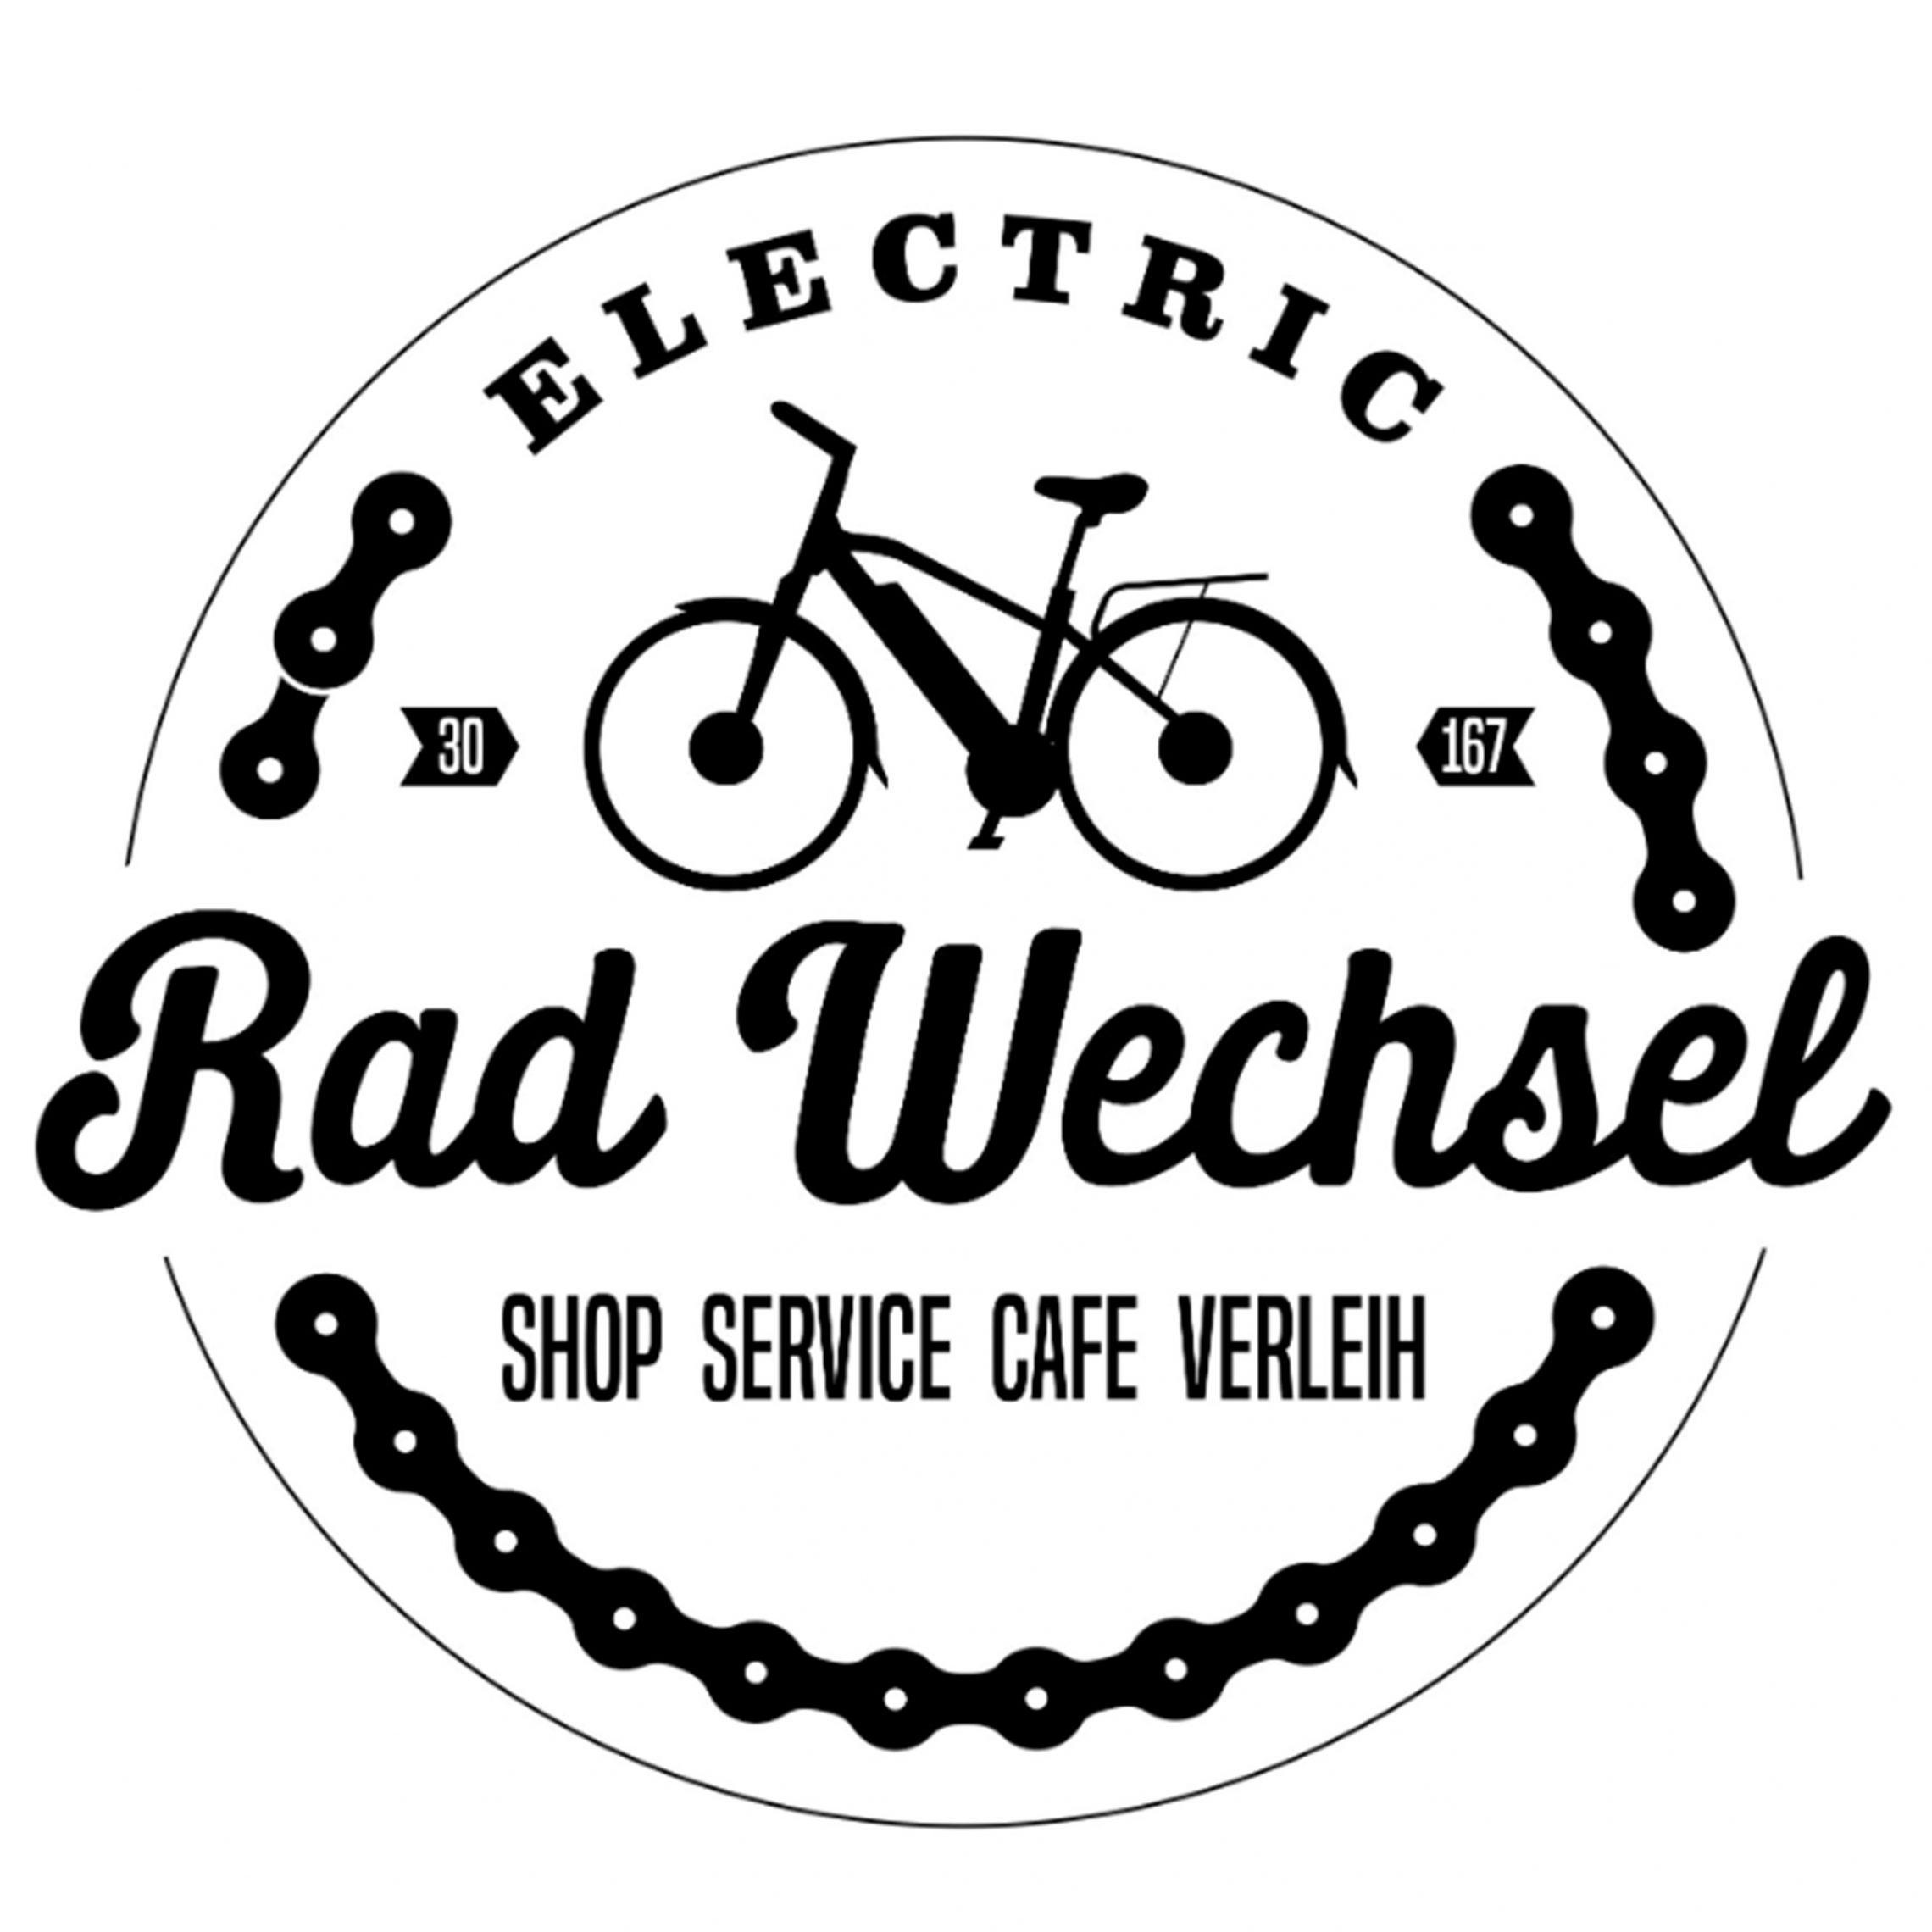 Style Hannover Radwechsel Online Shop scaled - Rad-Wechsel - ONLINE Shop